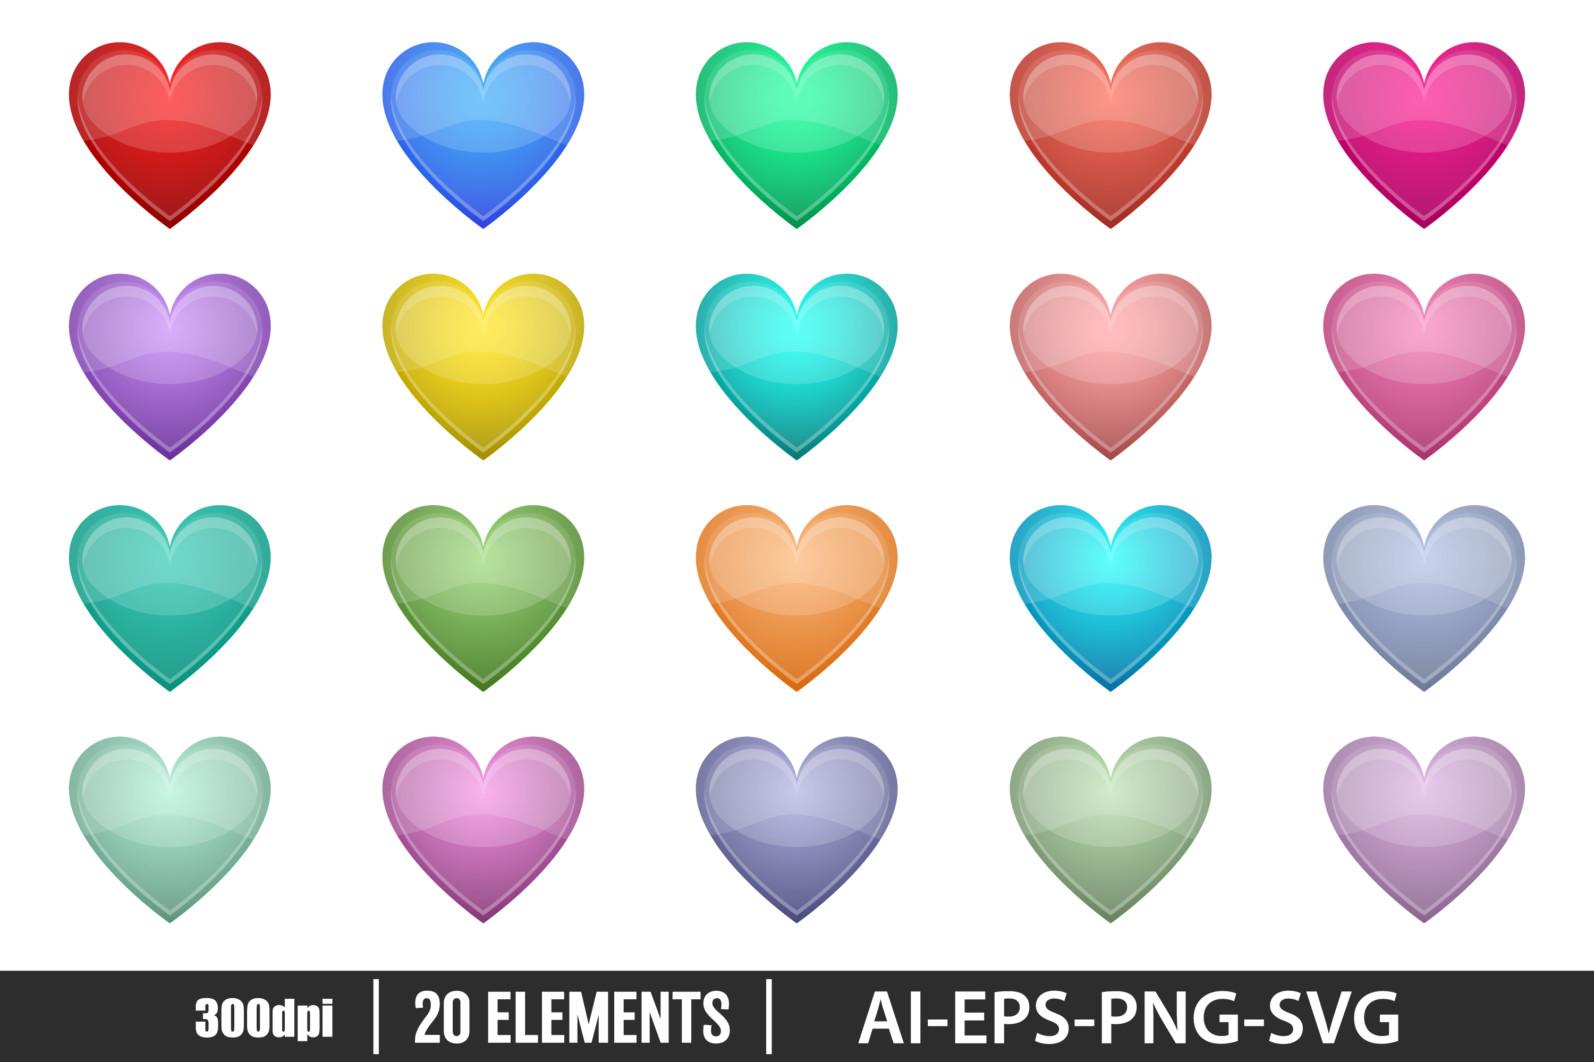 Shiny heart clipart vector design illustration. Heart set. Vector Clipart Print - HEART 1 scaled -